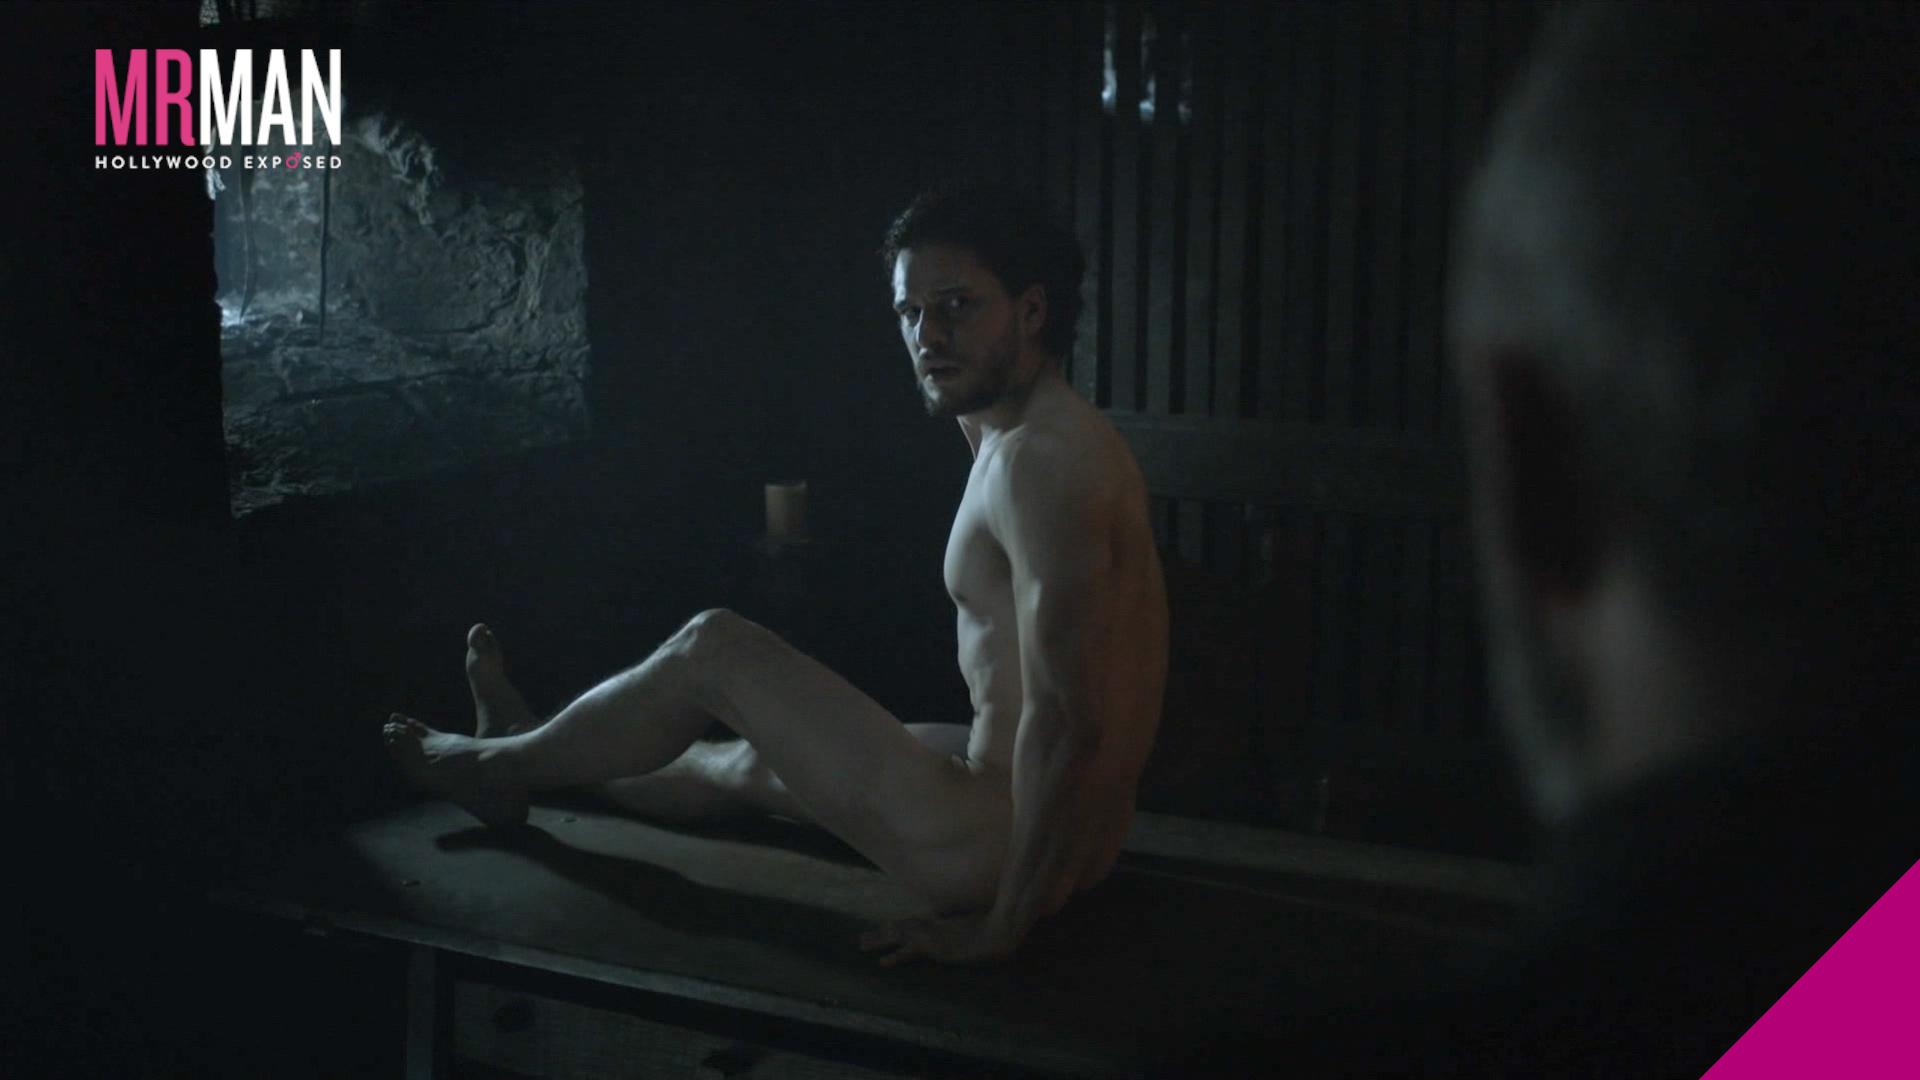 Harington is Finally Bare-ington on Game of Thrones